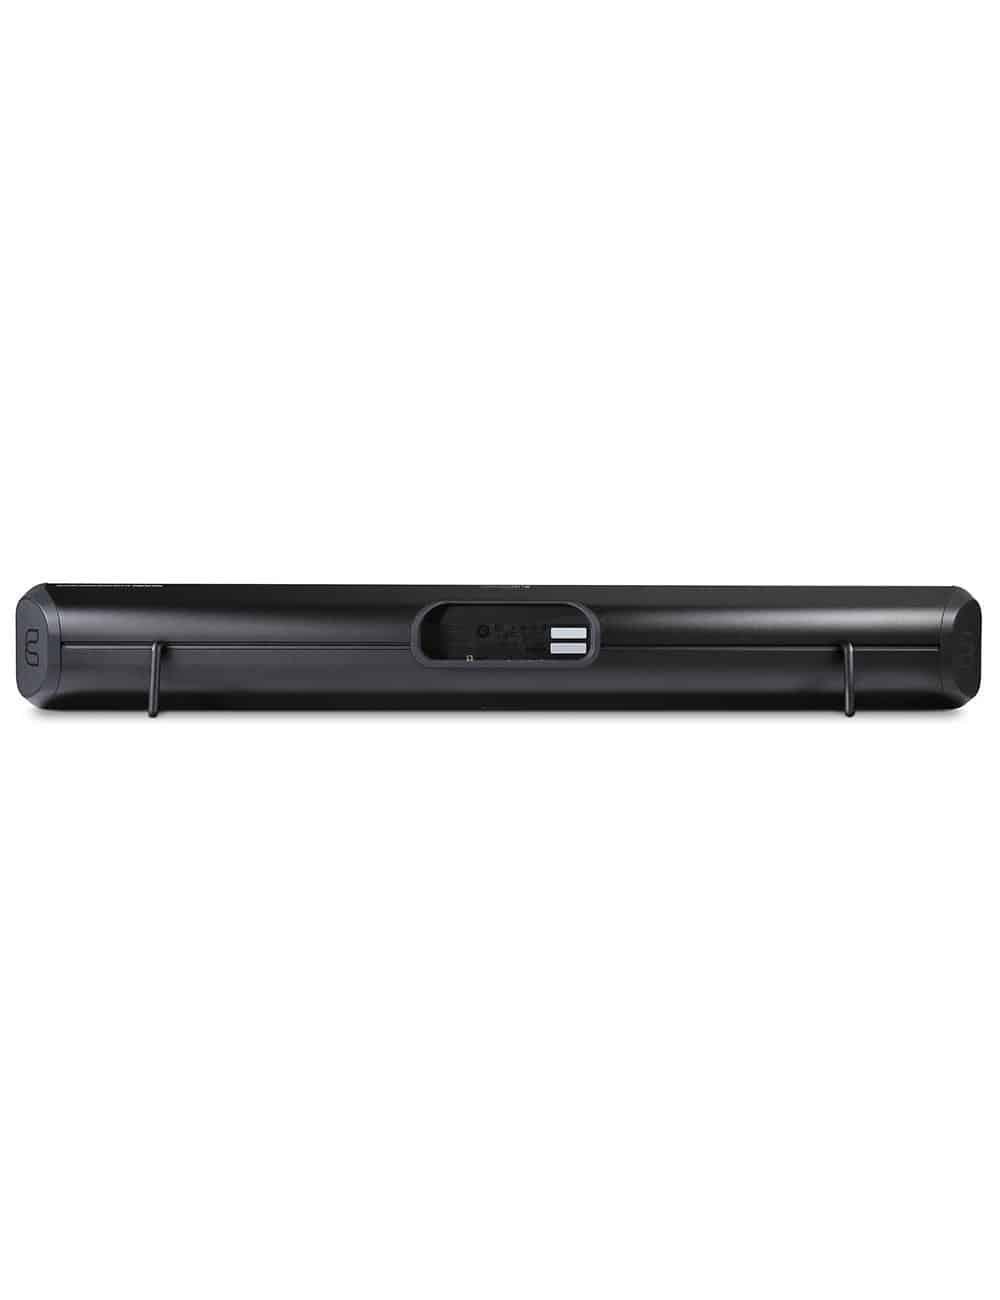 soundbar wireless streaming HiFi, Bluesound Soundbar 2i, vista posteriore, finitura nero